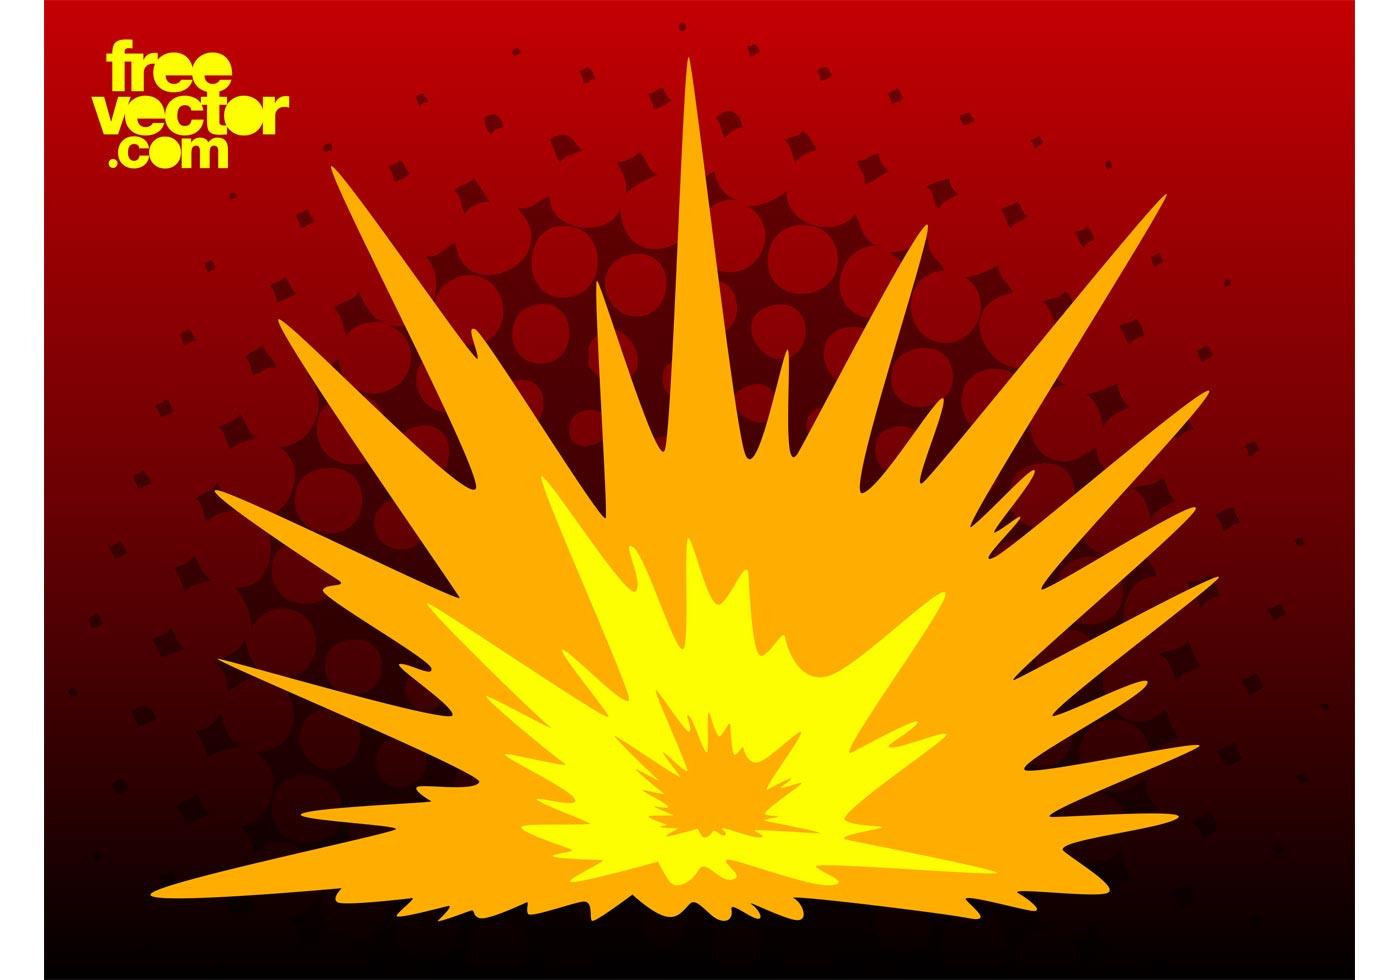 Calendar Maker Art Explosion : Explosion free vector art downloads